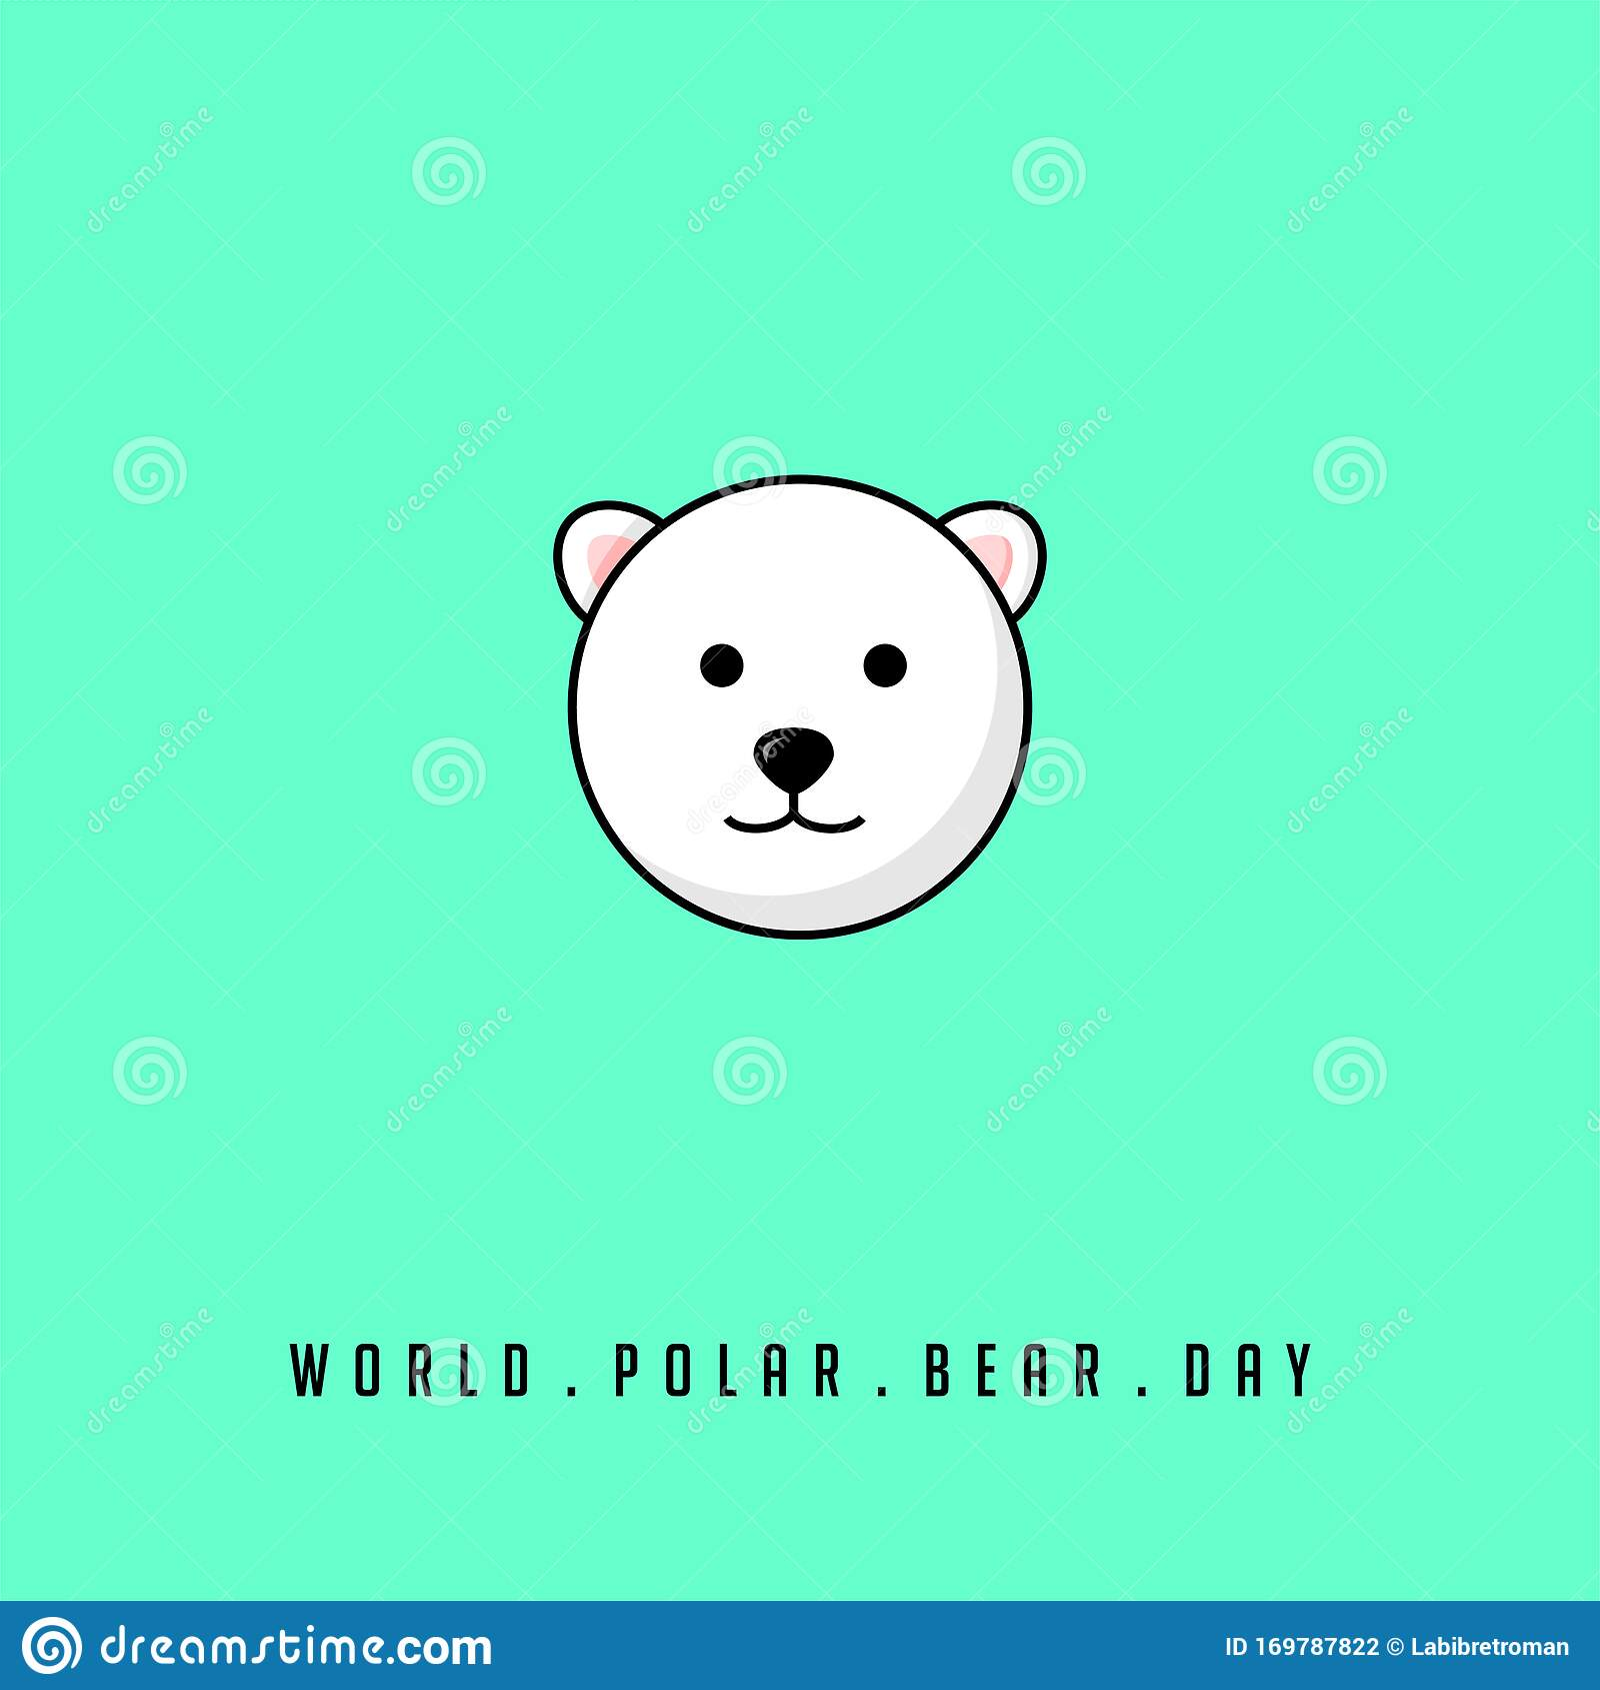 World Polar Bear Day Stock Vector Illustration Of Life 169787822